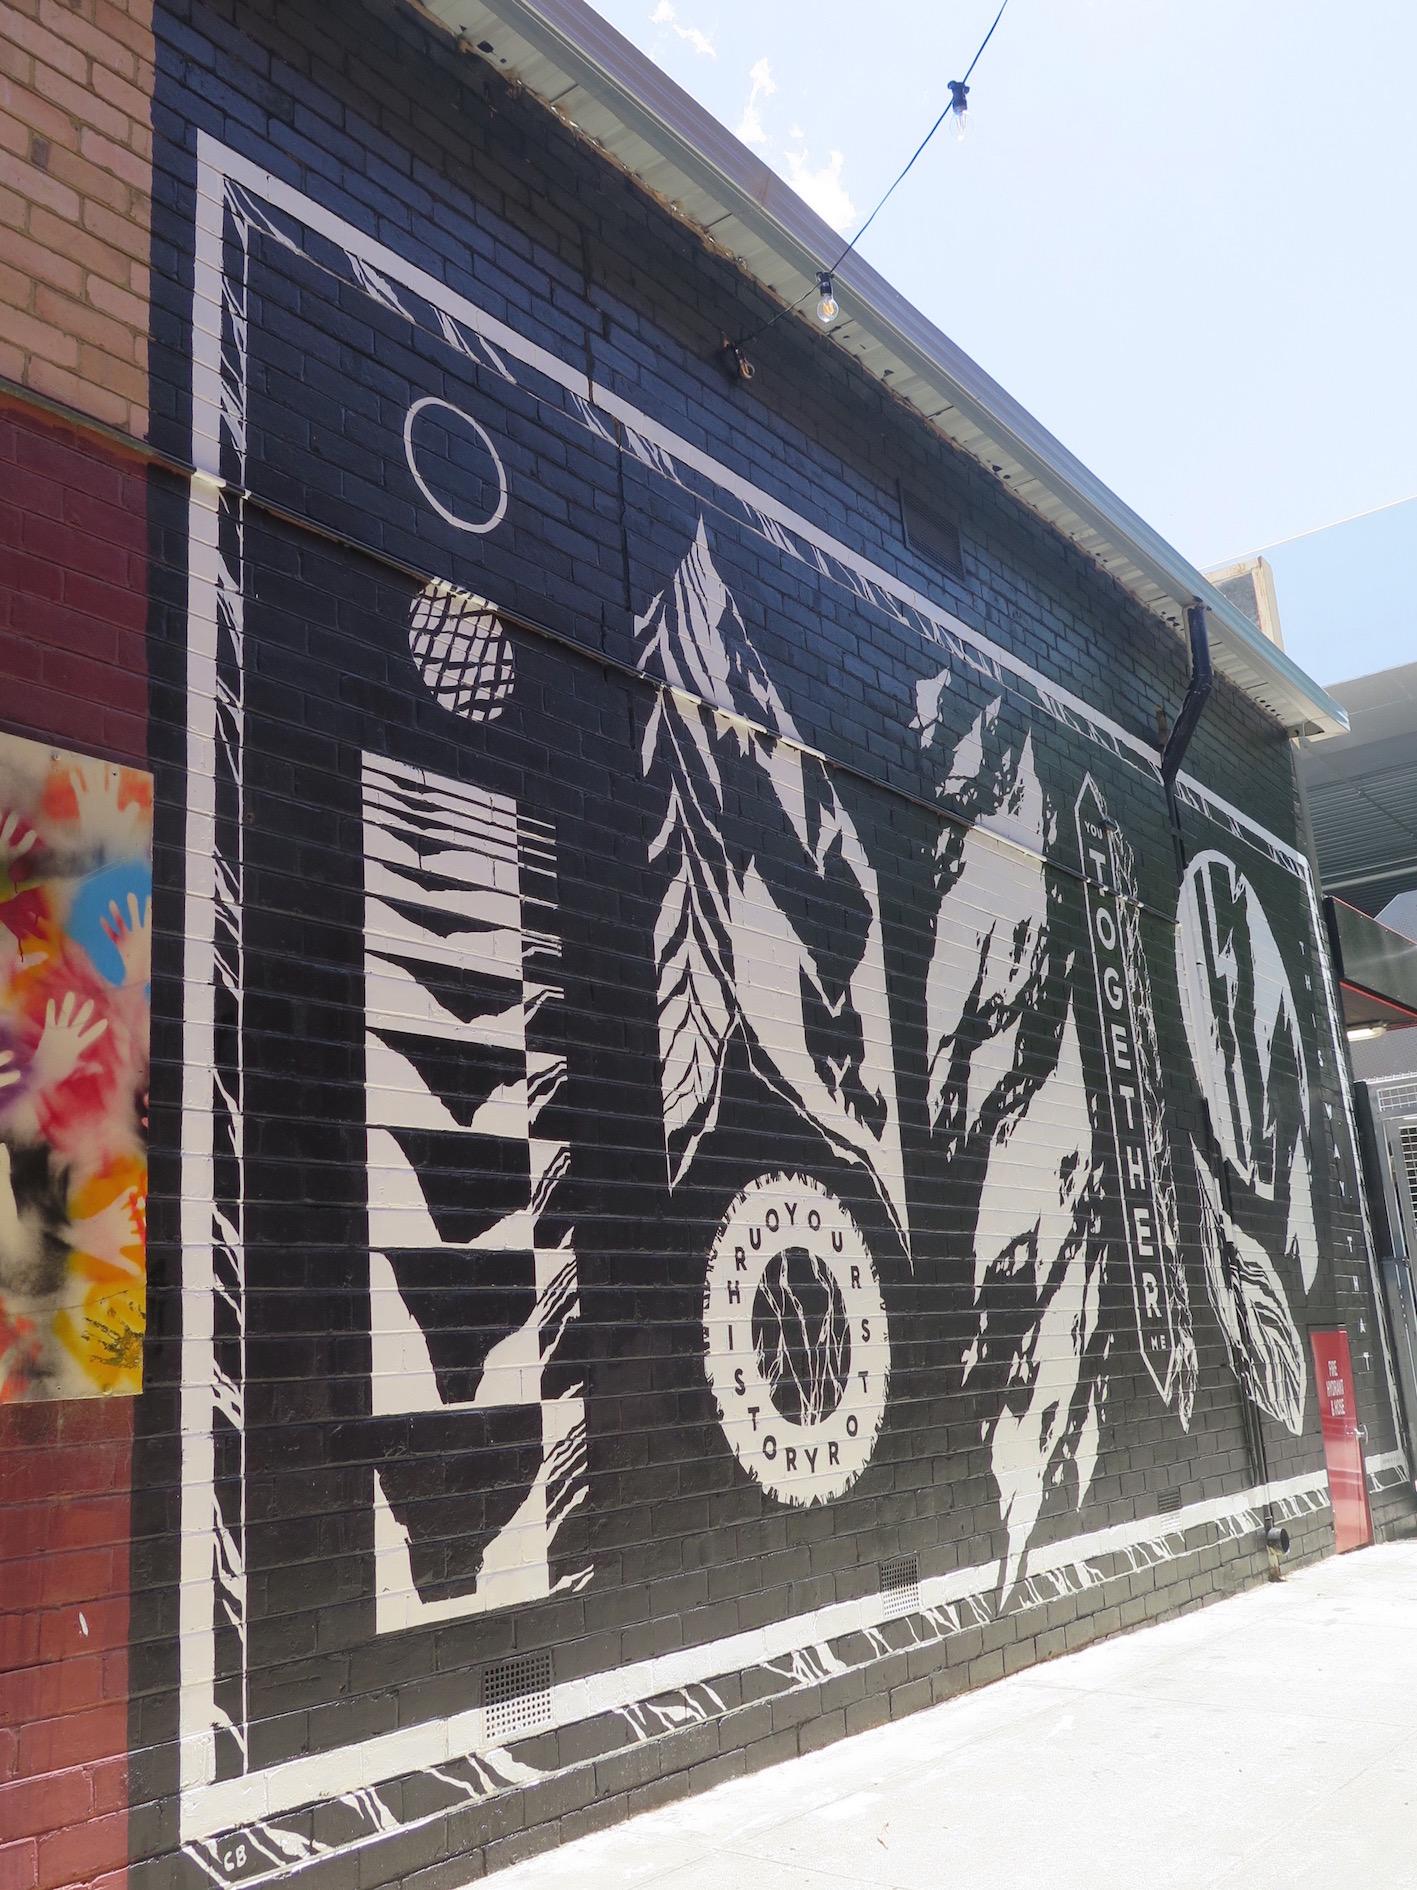 deansunshine_landofsunshine_melbourne_streetart_graffiti_eastland urban art project 15 georgia hill